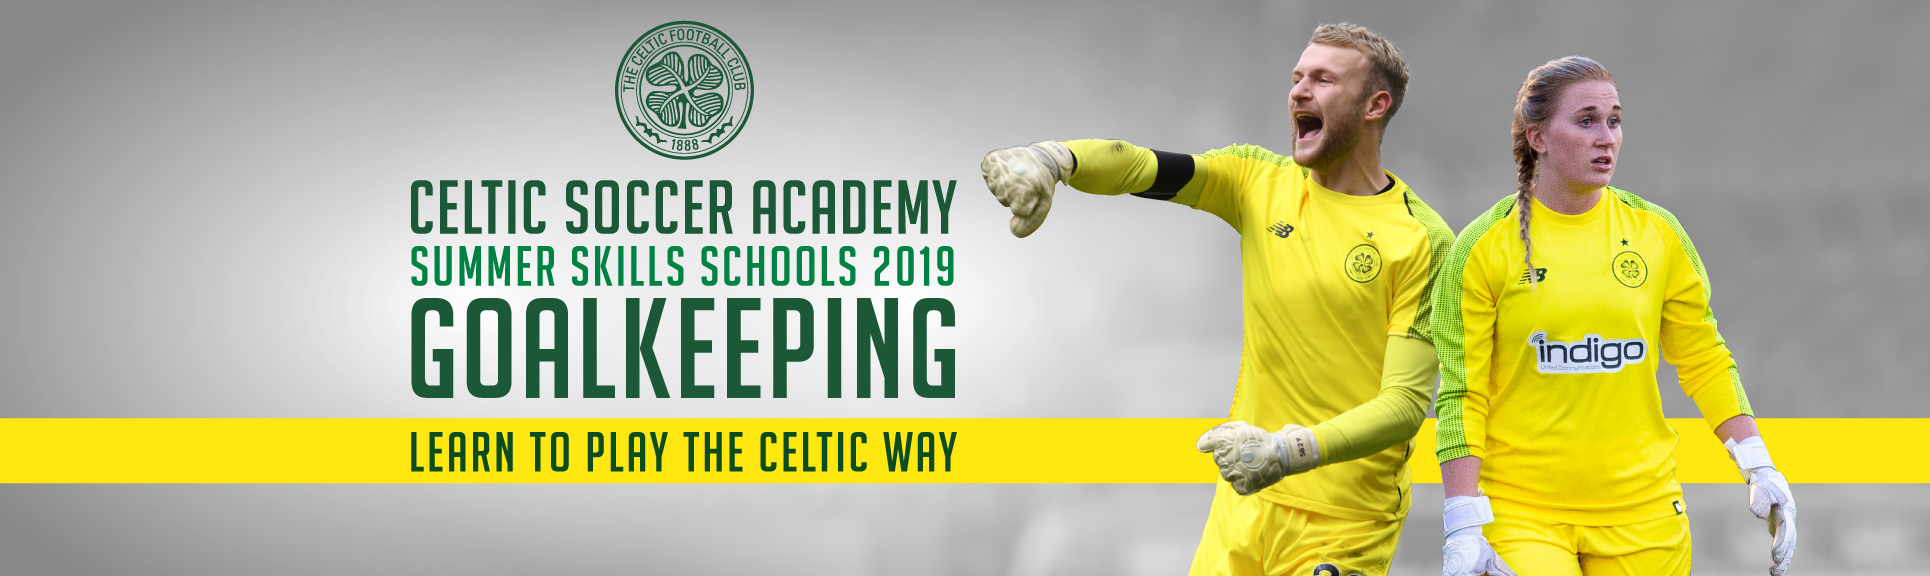 Celtic-Summer-Skills19-Graphics_Goalkeeping_Carousel-1930x576